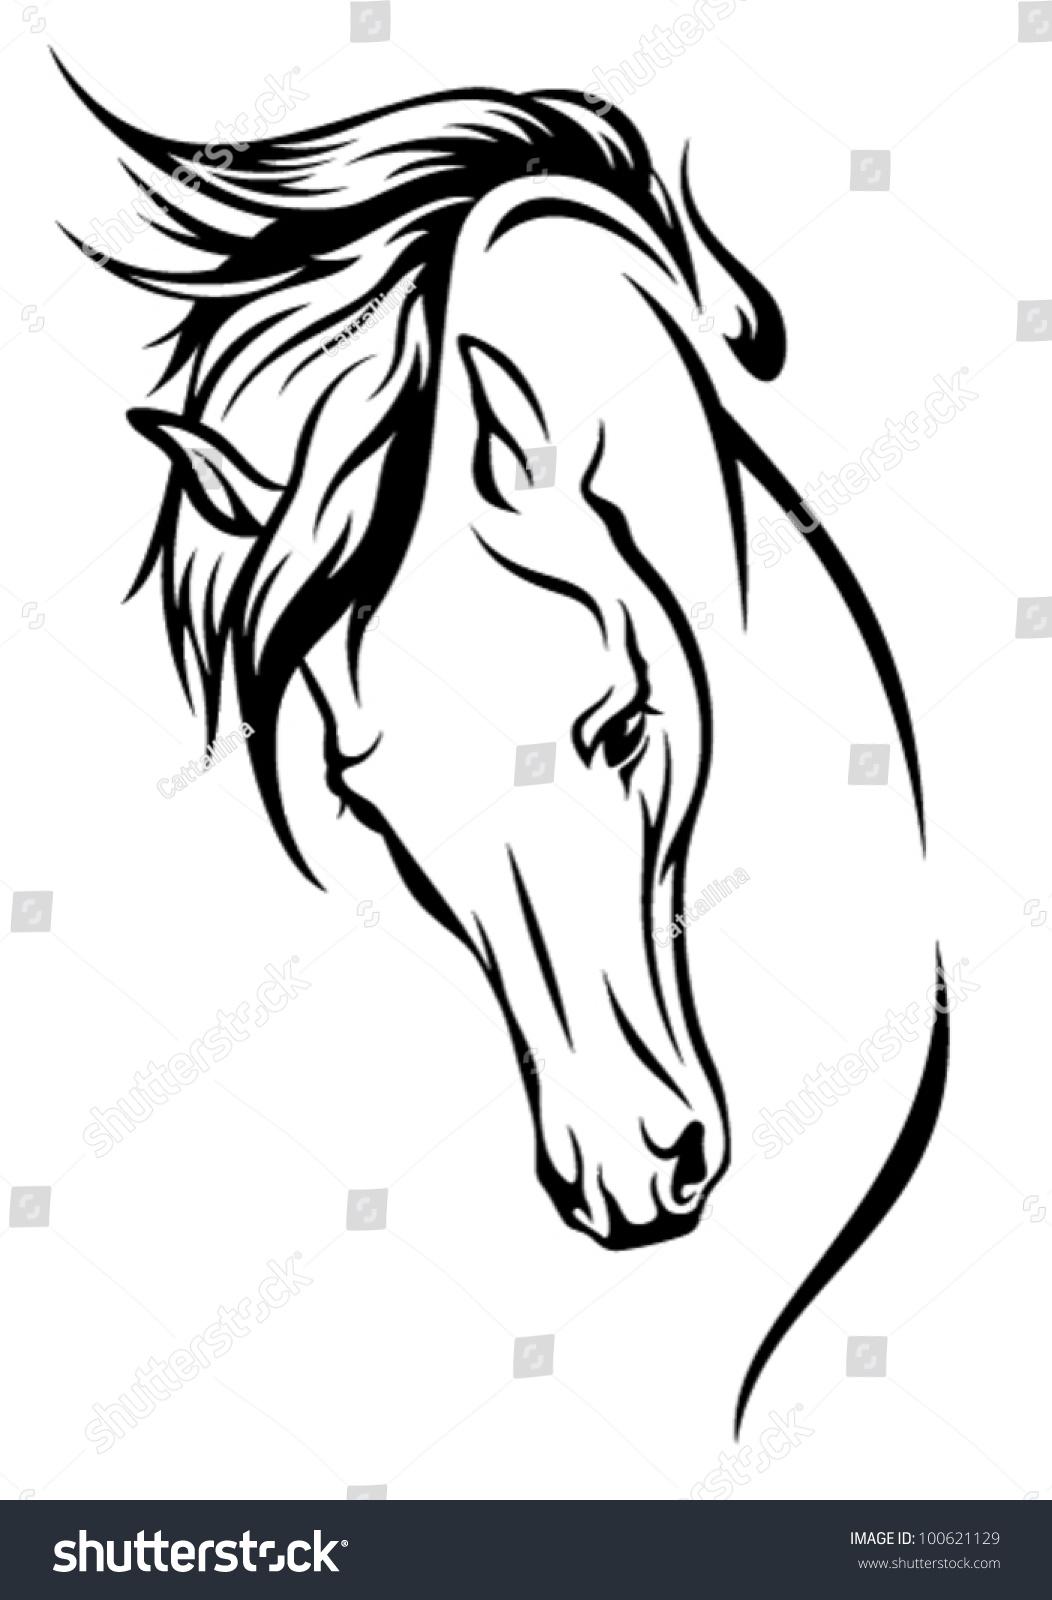 Line Drawing Horse Head : Horse head flying mane vector illustration stock